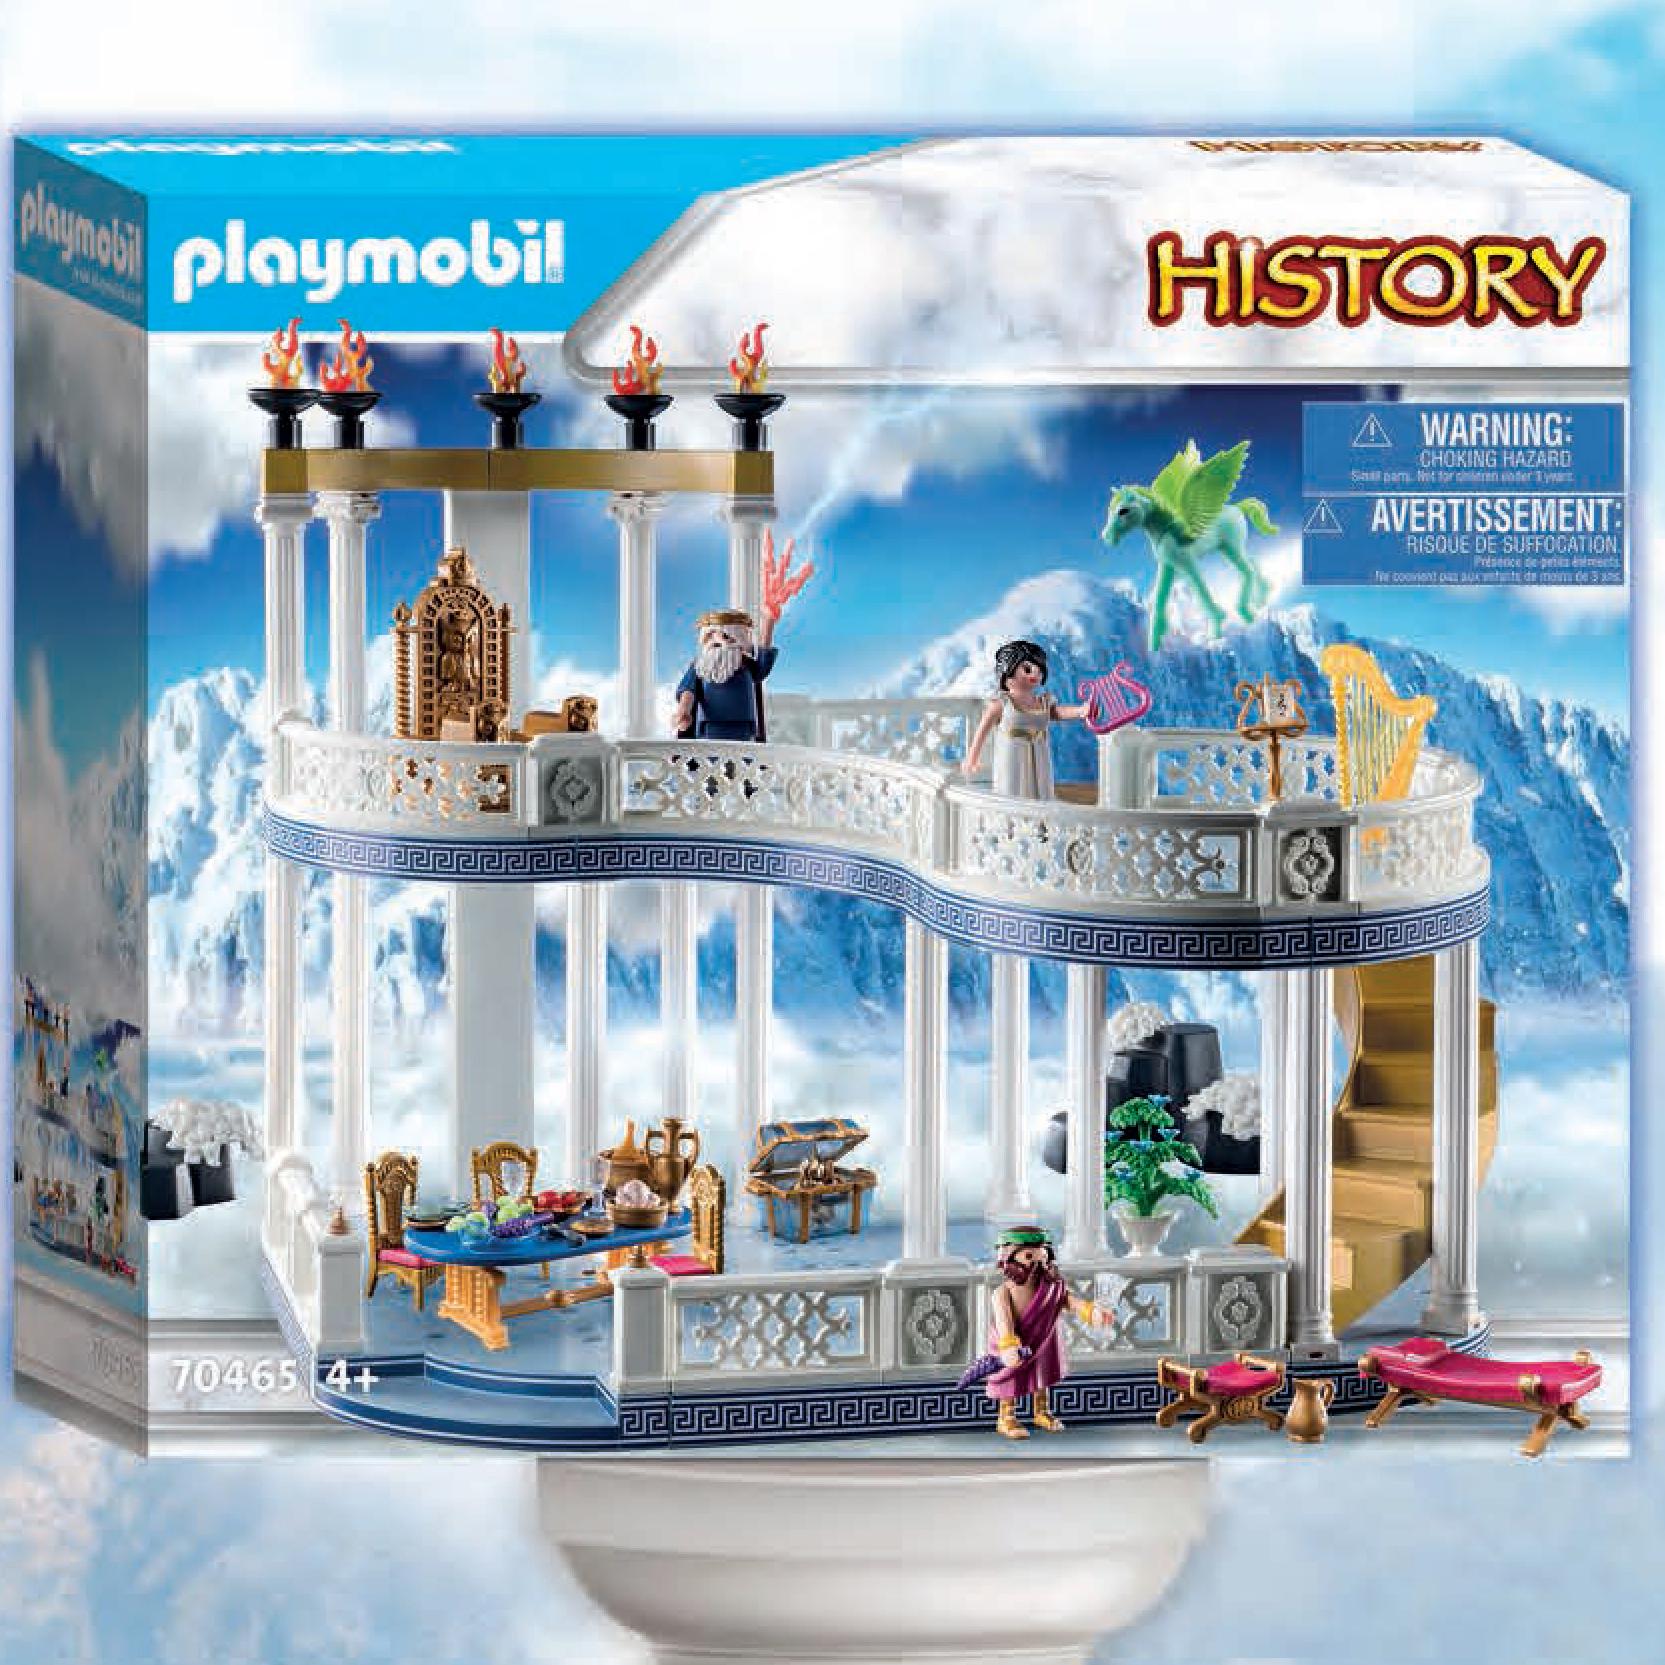 Playmobil décor grec ou romain playmobil the movie